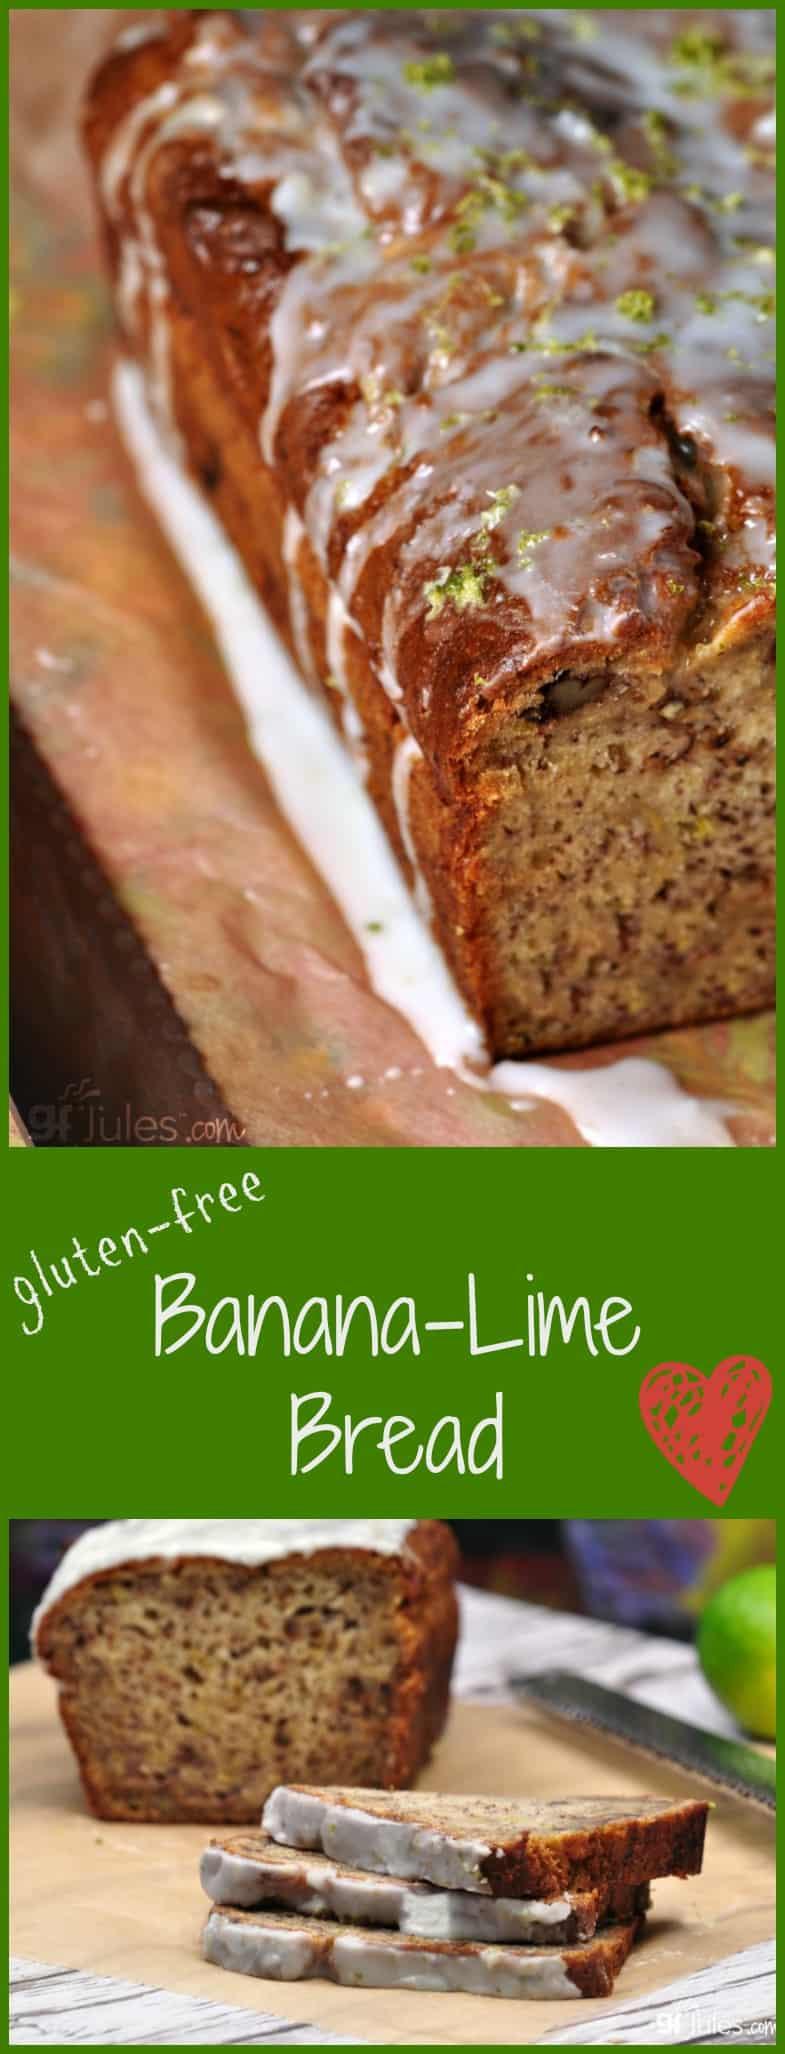 Banana Bread Dairy Free  Gluten Free Banana Lime Bread Moist & Flavorful gfJules